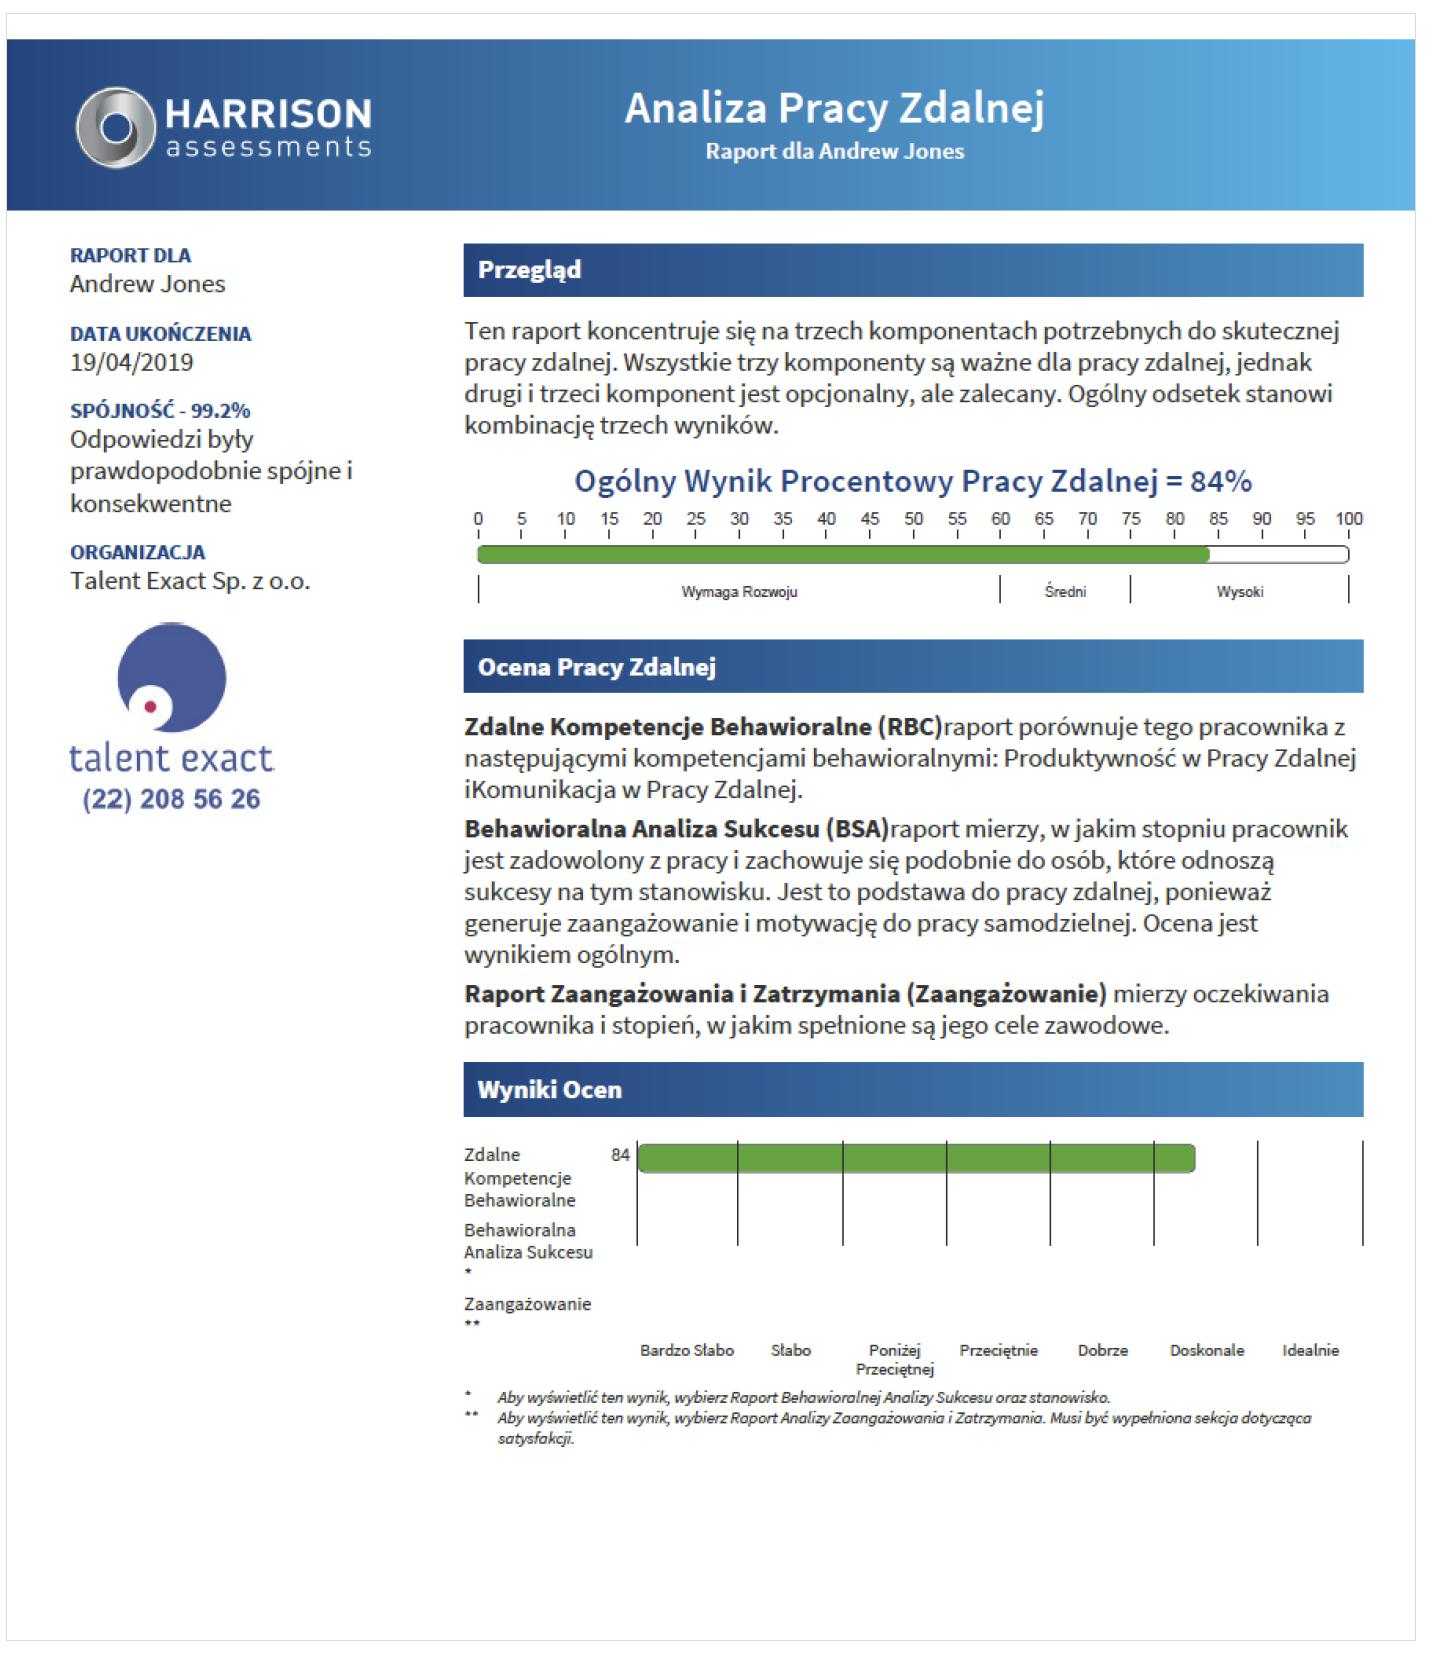 Kompetencje pracy zdalnej - Harrison Analytics